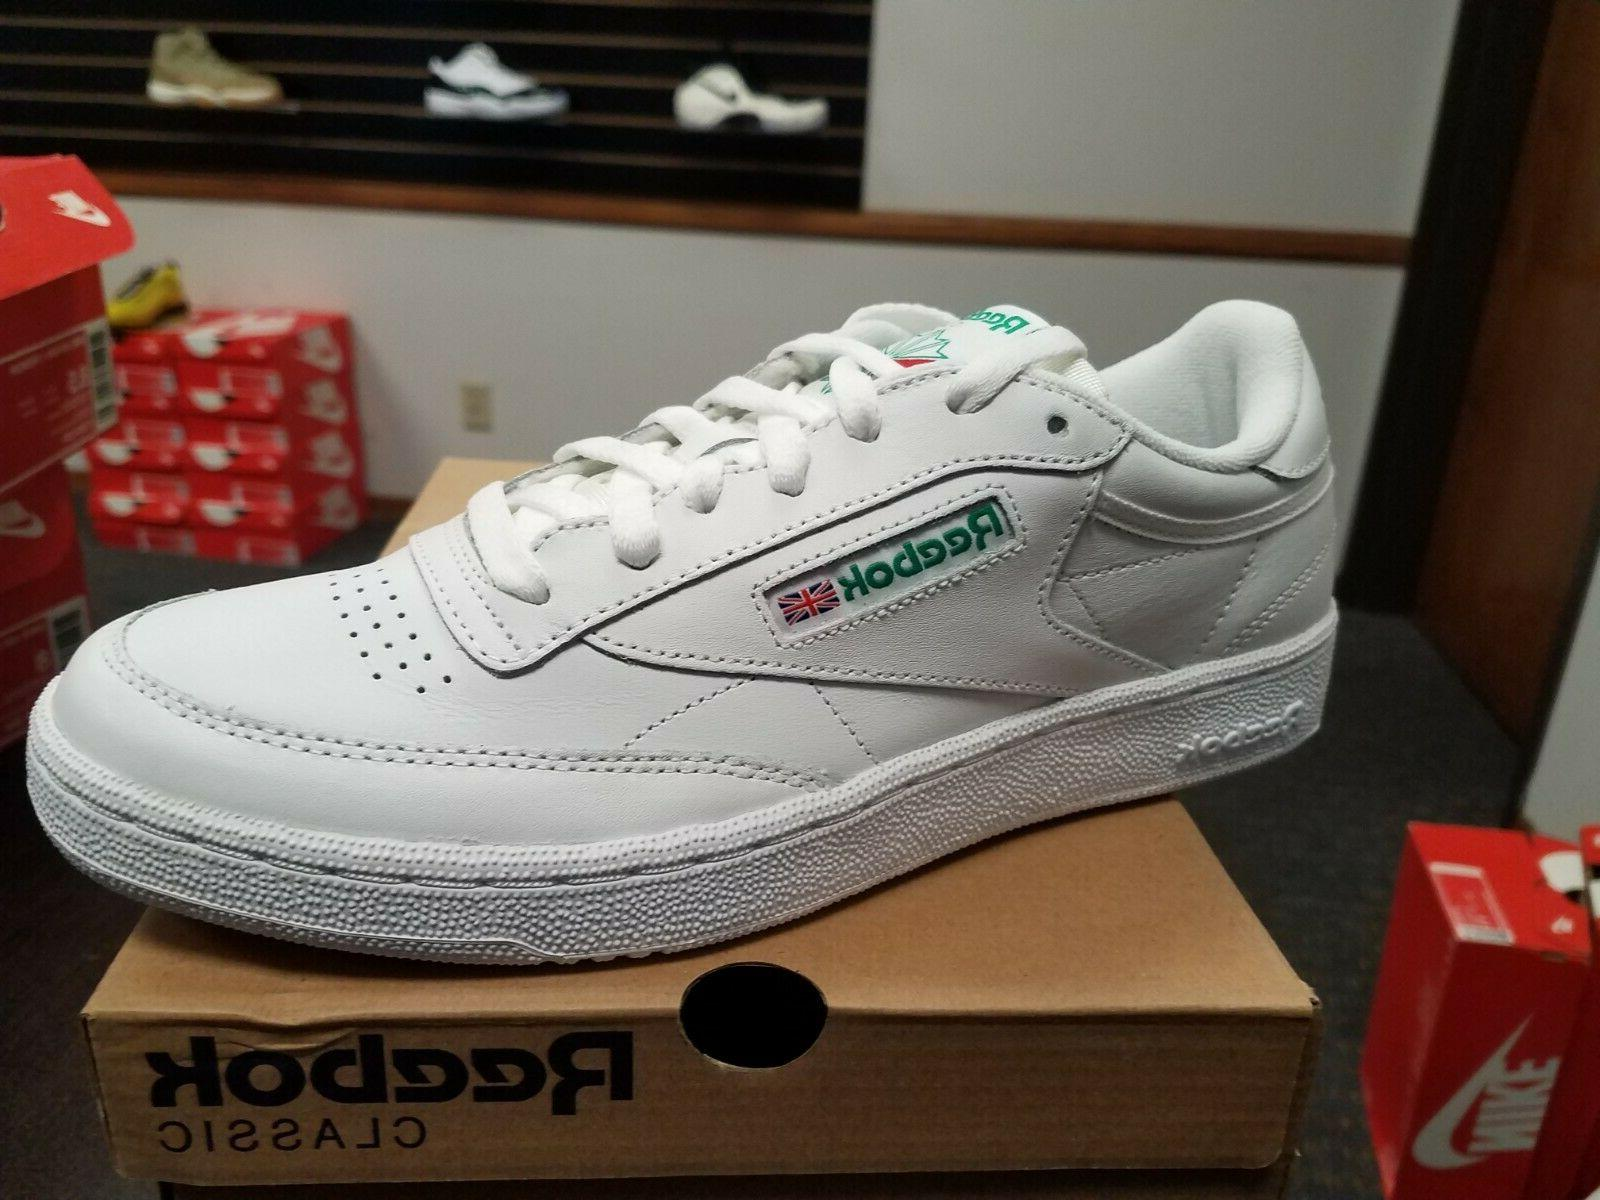 brand new men s tennis shoes club